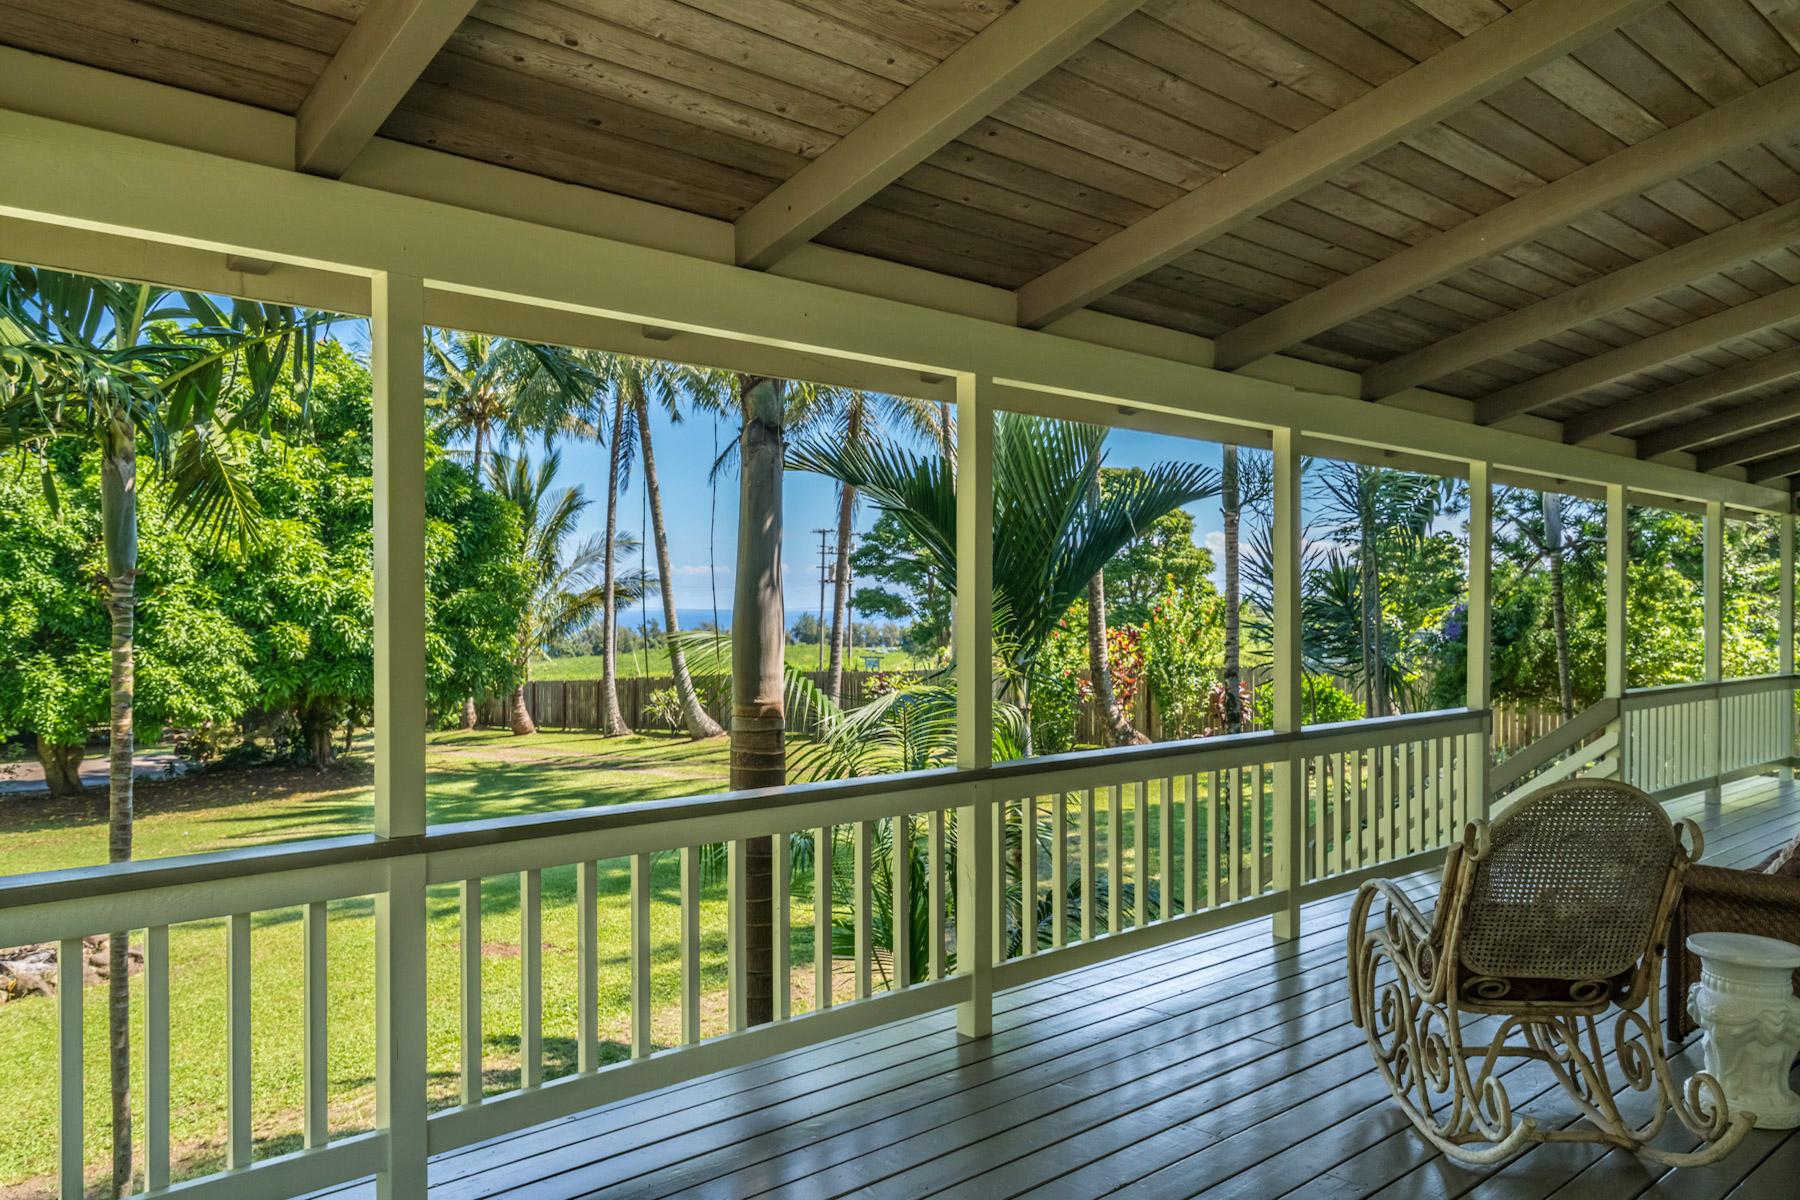 Single Family Home for Active at Niulii Village 52-4608 Akoni Pule Hwy Kapaau, Hawaii 96755 United States